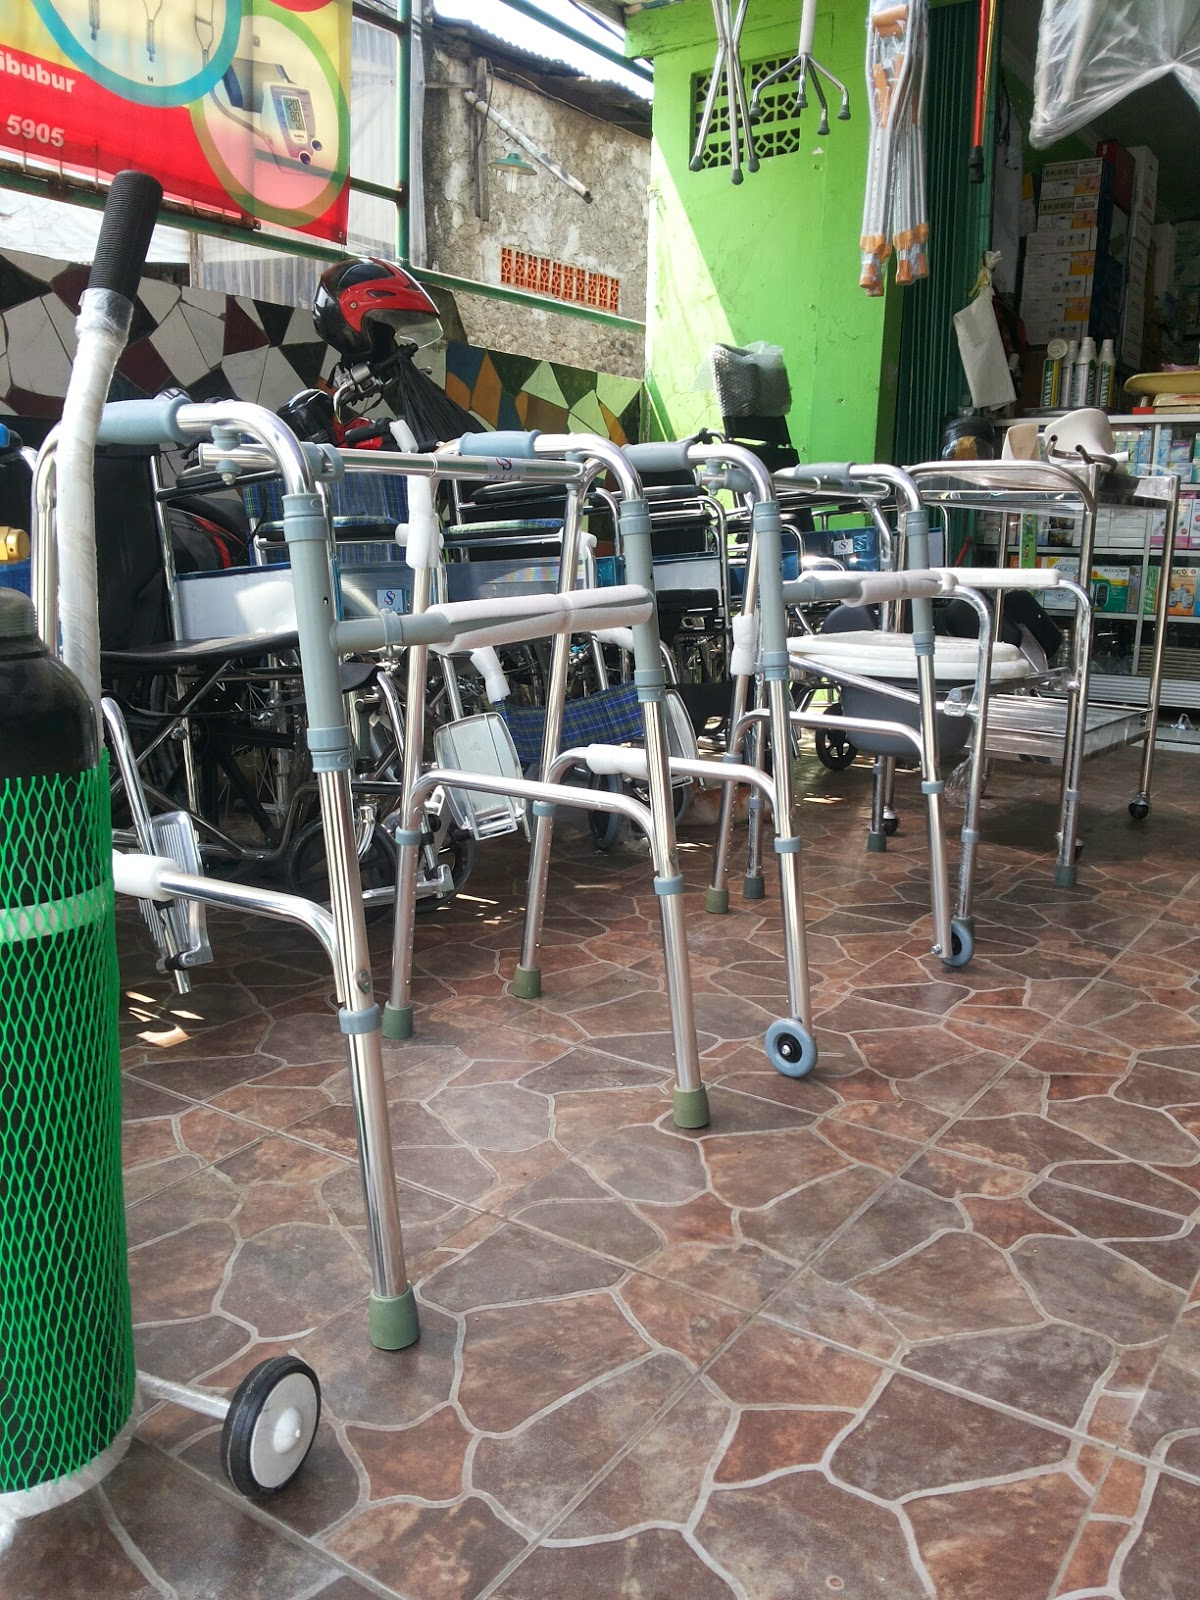 Alat Bantu Berjalan Walker Standart Dan Roda Cibubur Toko Tongkat Aneka Kursi Rodatongkat